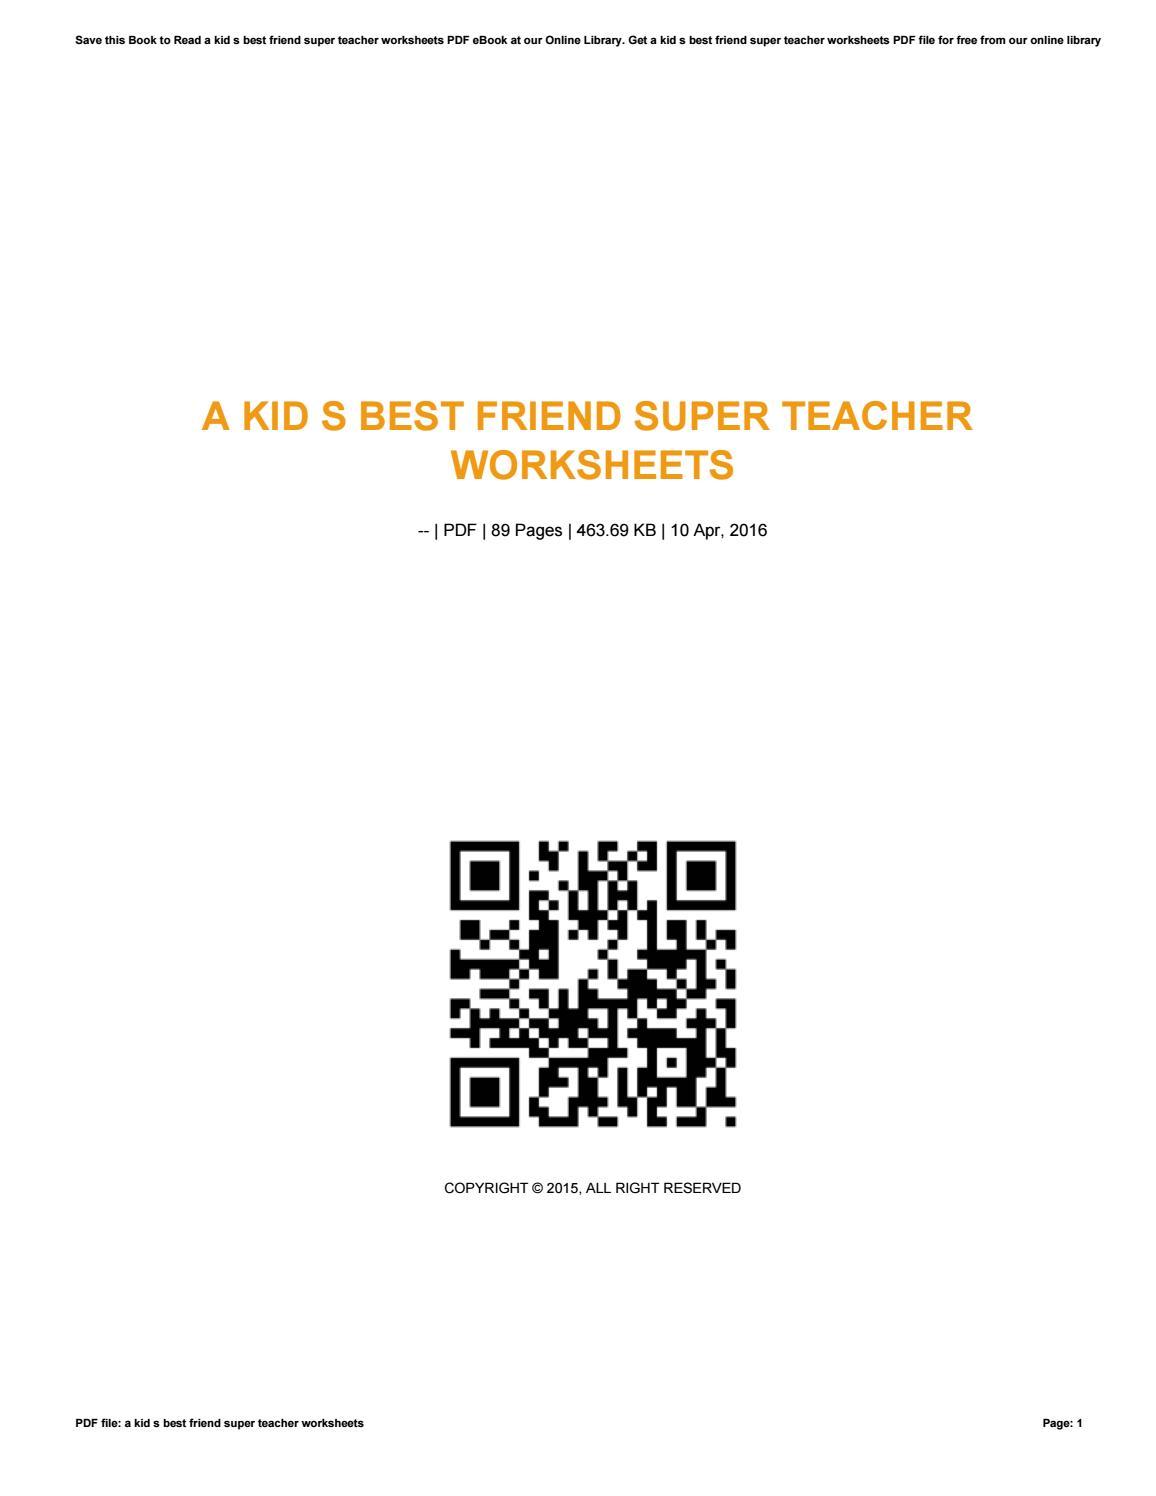 Workbooks super teacher worksheets pdf : A kid s best friend super teacher worksheets by farfurmail5 - issuu